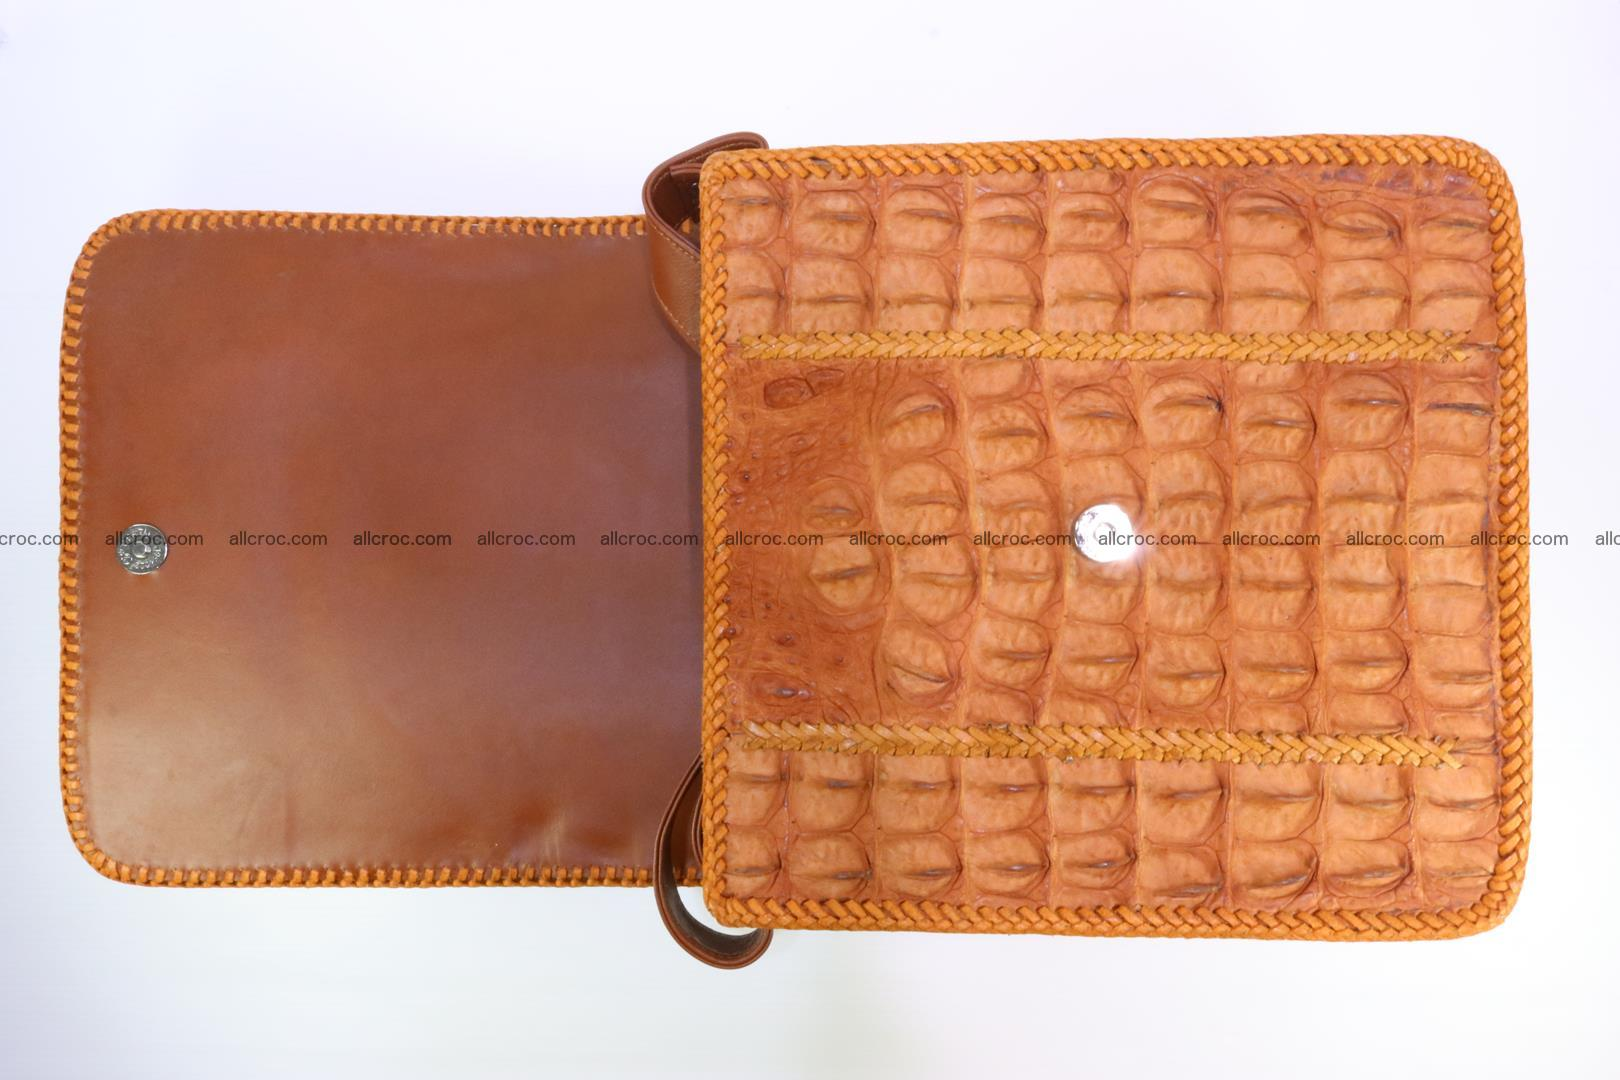 Сrocodile skin shoulder bag with braided edges 141 Foto 11